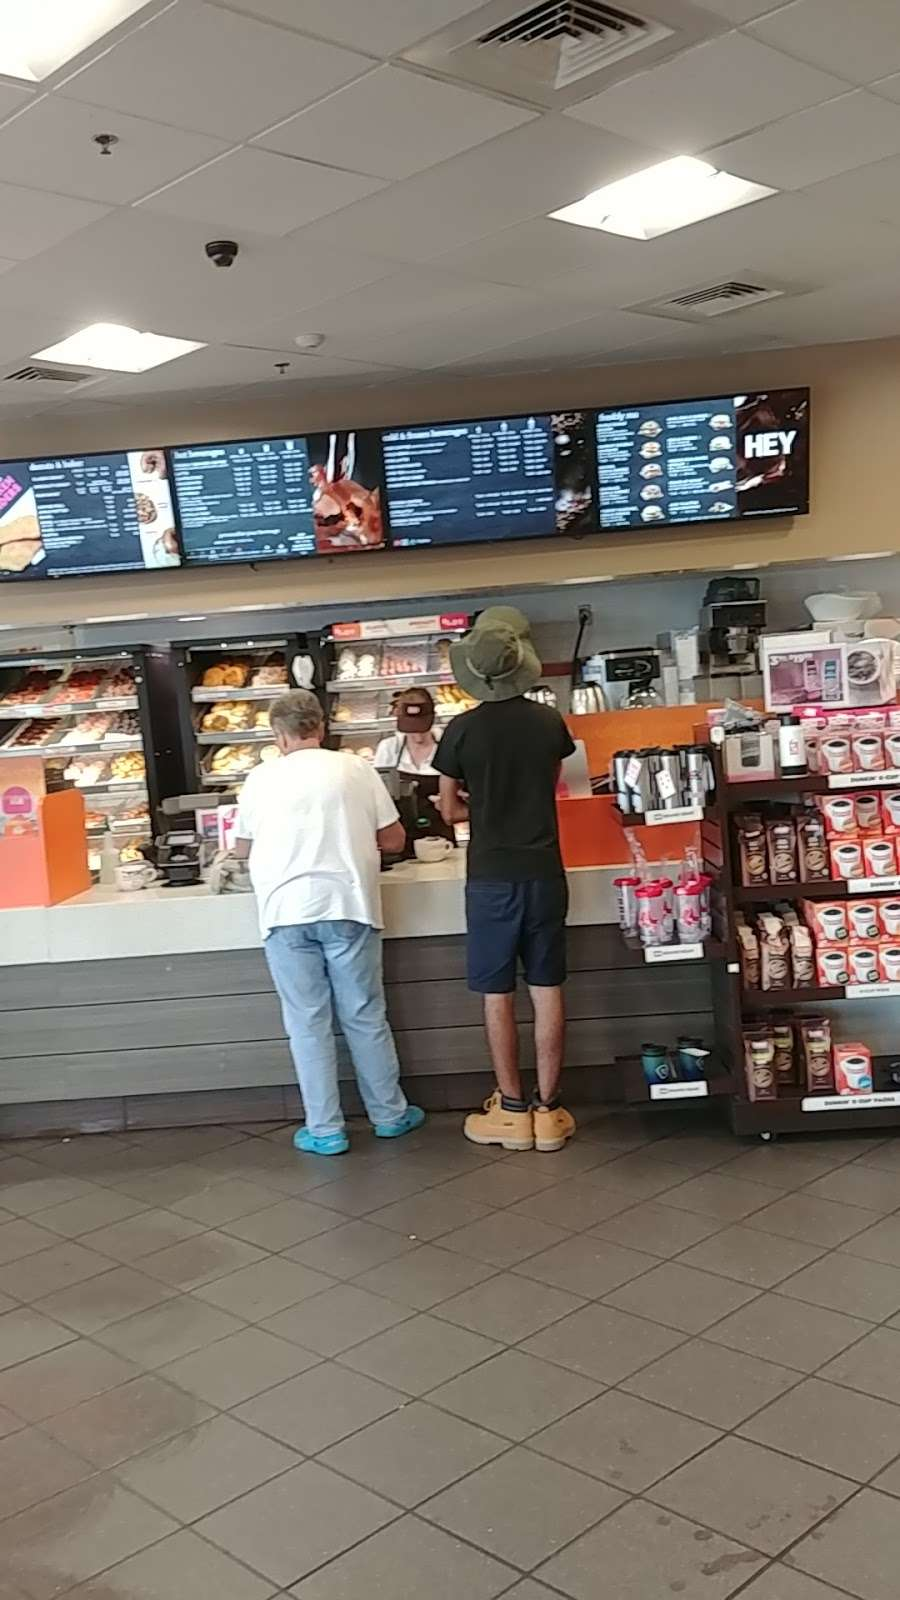 Dunkin - bakery  | Photo 7 of 15 | Address: 61 Main St, Salisbury, MA 01952, USA | Phone: (978) 462-1189